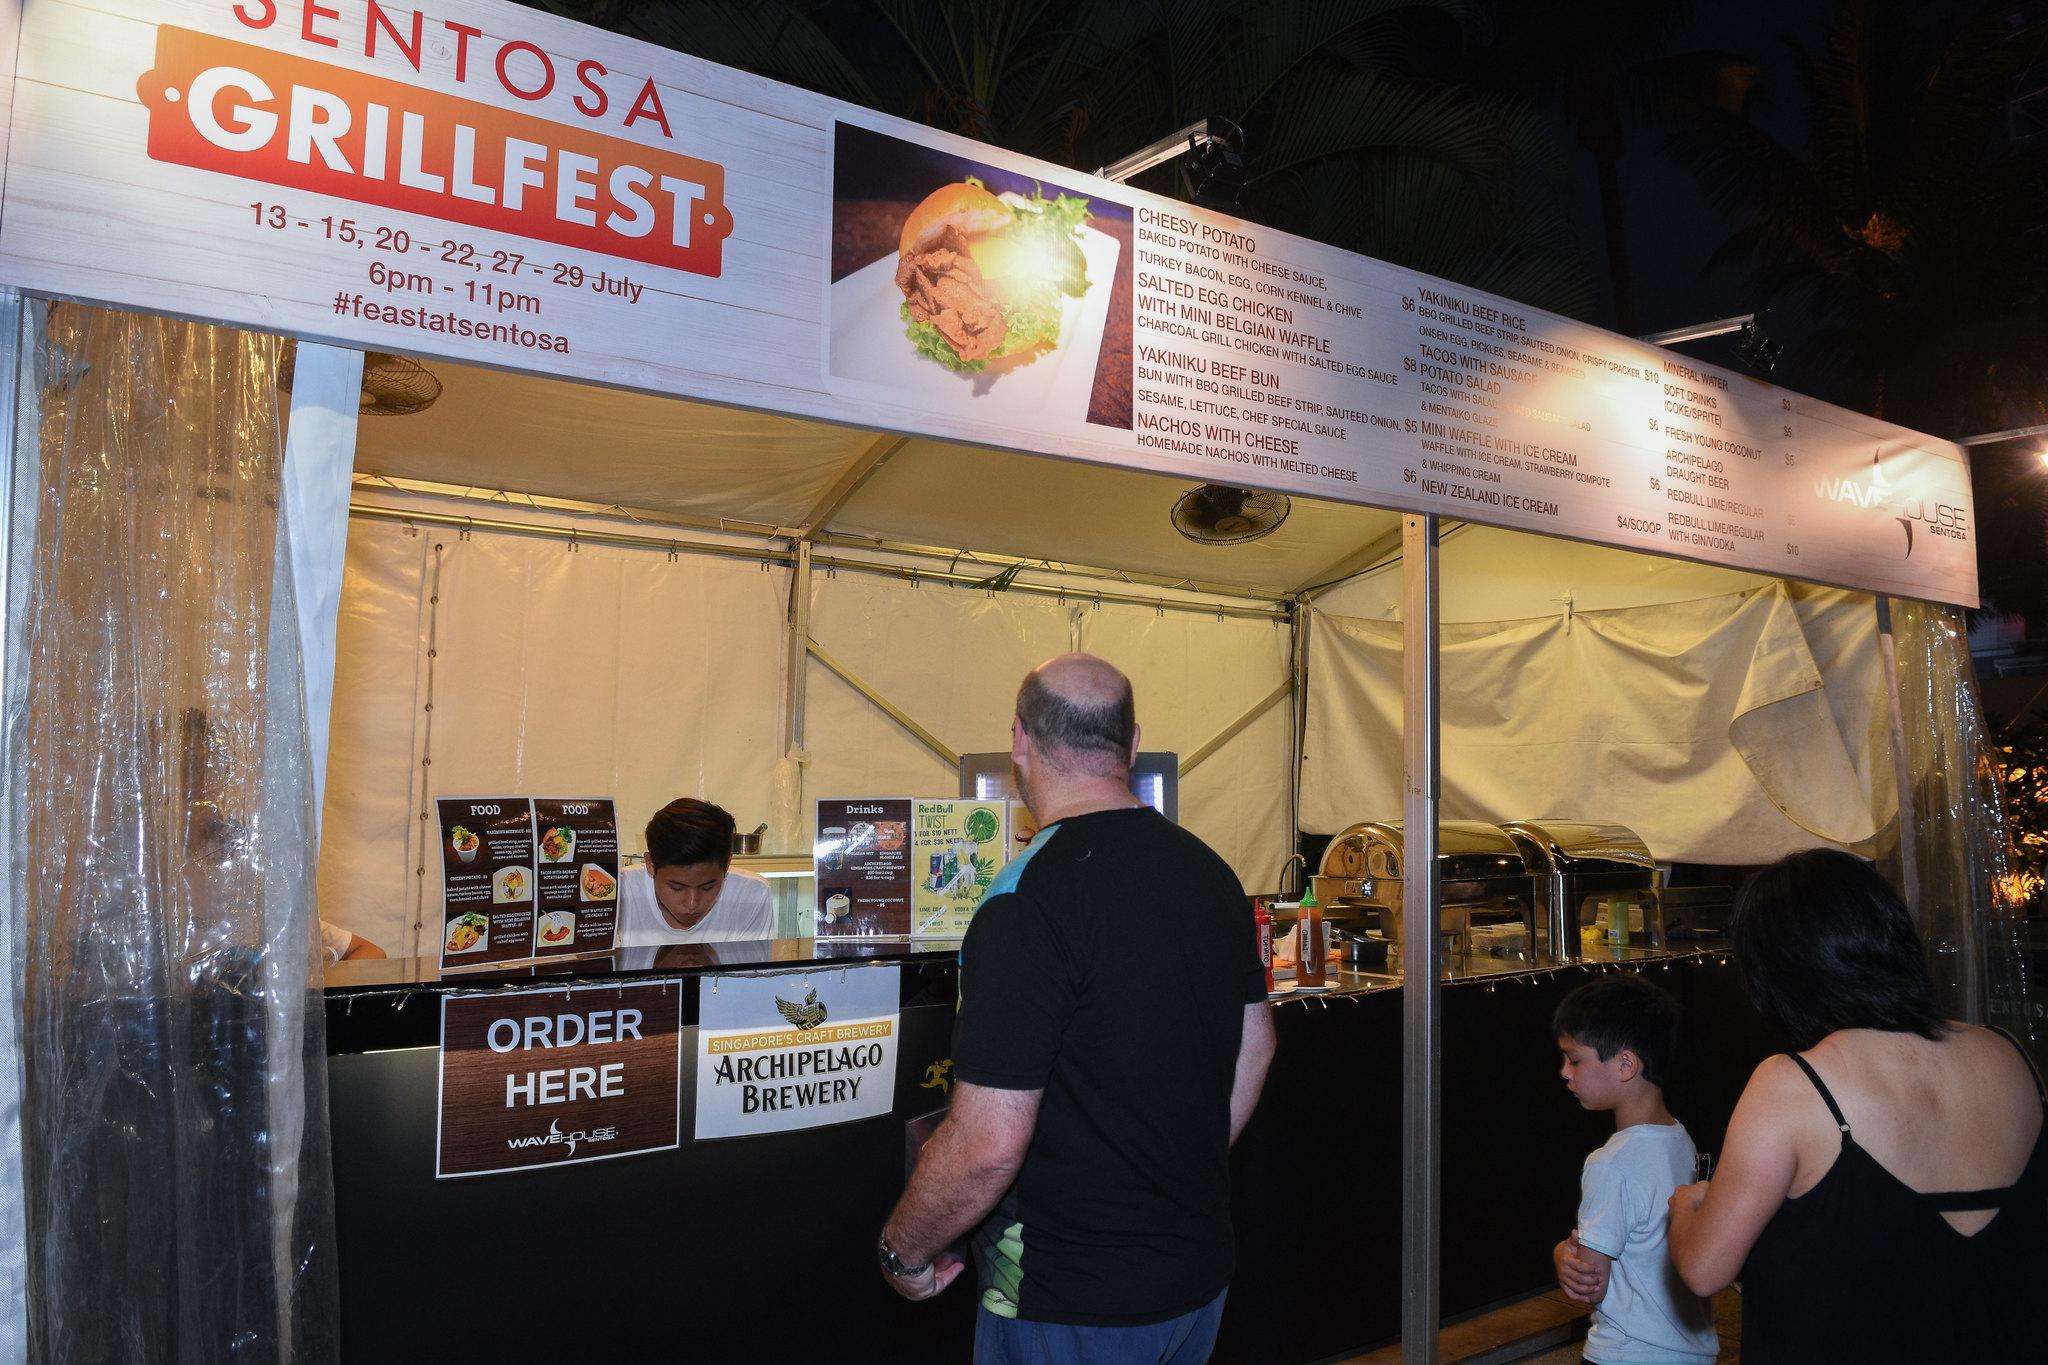 圣淘沙Grillfest DSC_-1